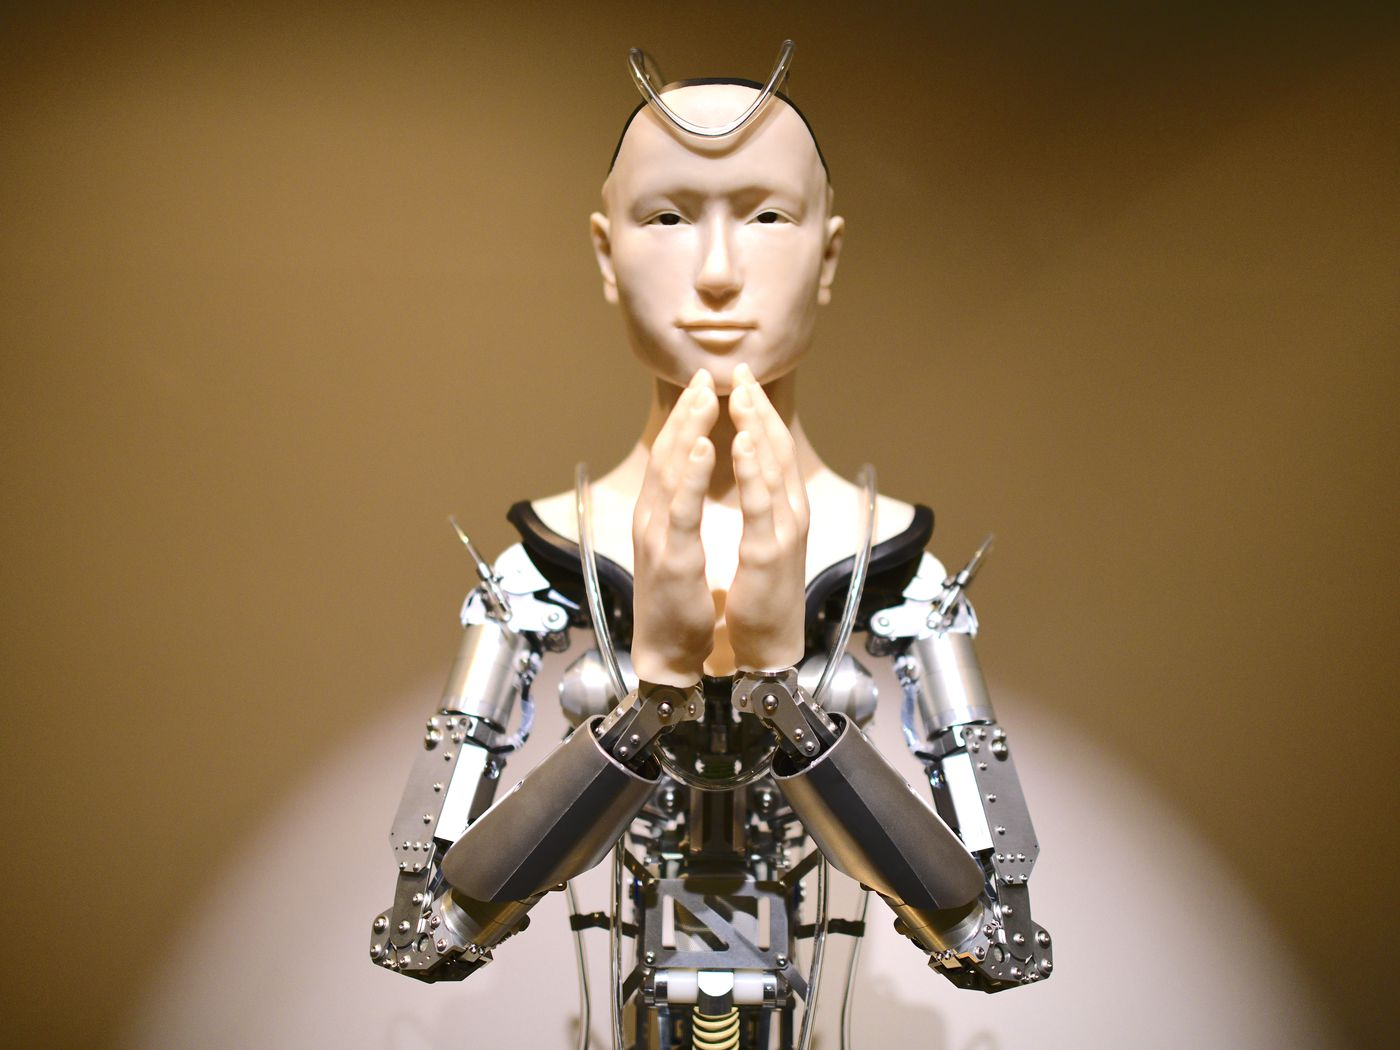 robot million 2.0 reclame aqui